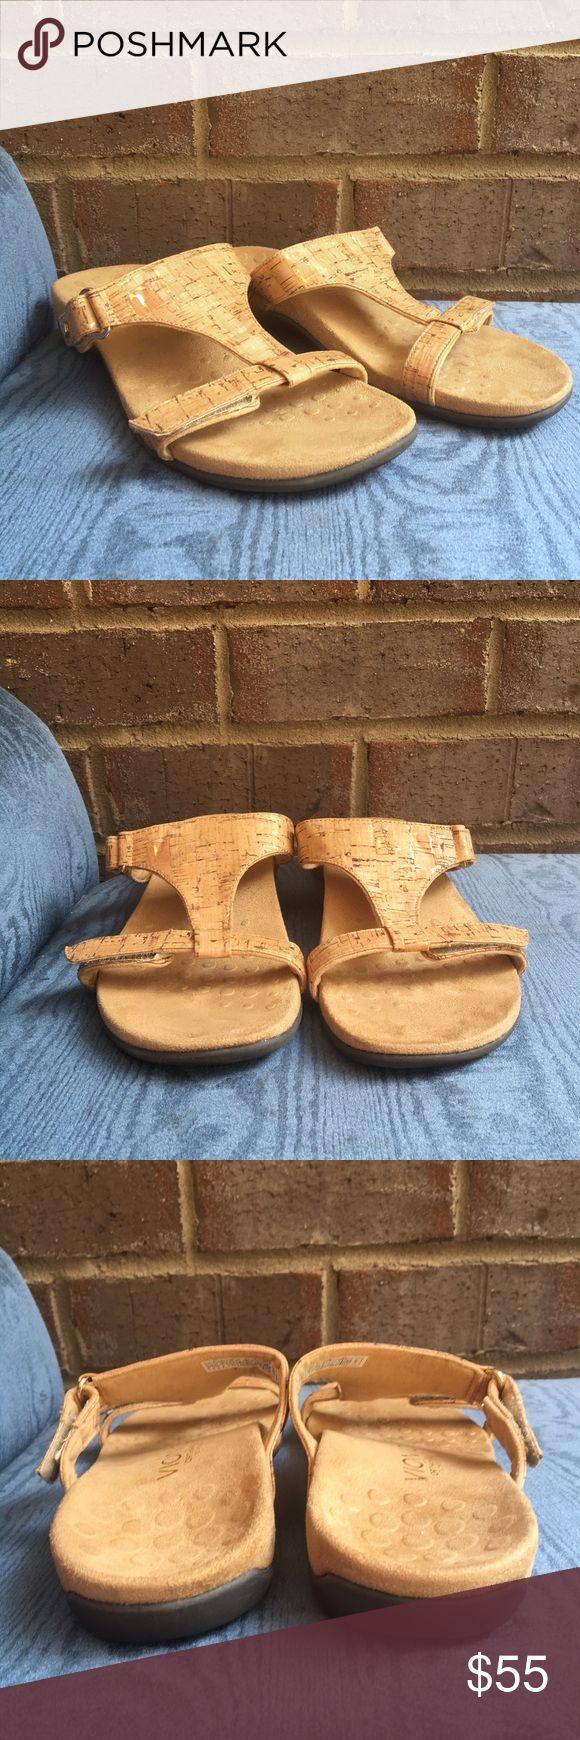 Women's sandals good for plantar fasciitis uk - Vionic Orthopedic Arch Support Sandals Plantar Fasciitisarchesstitchpersonal